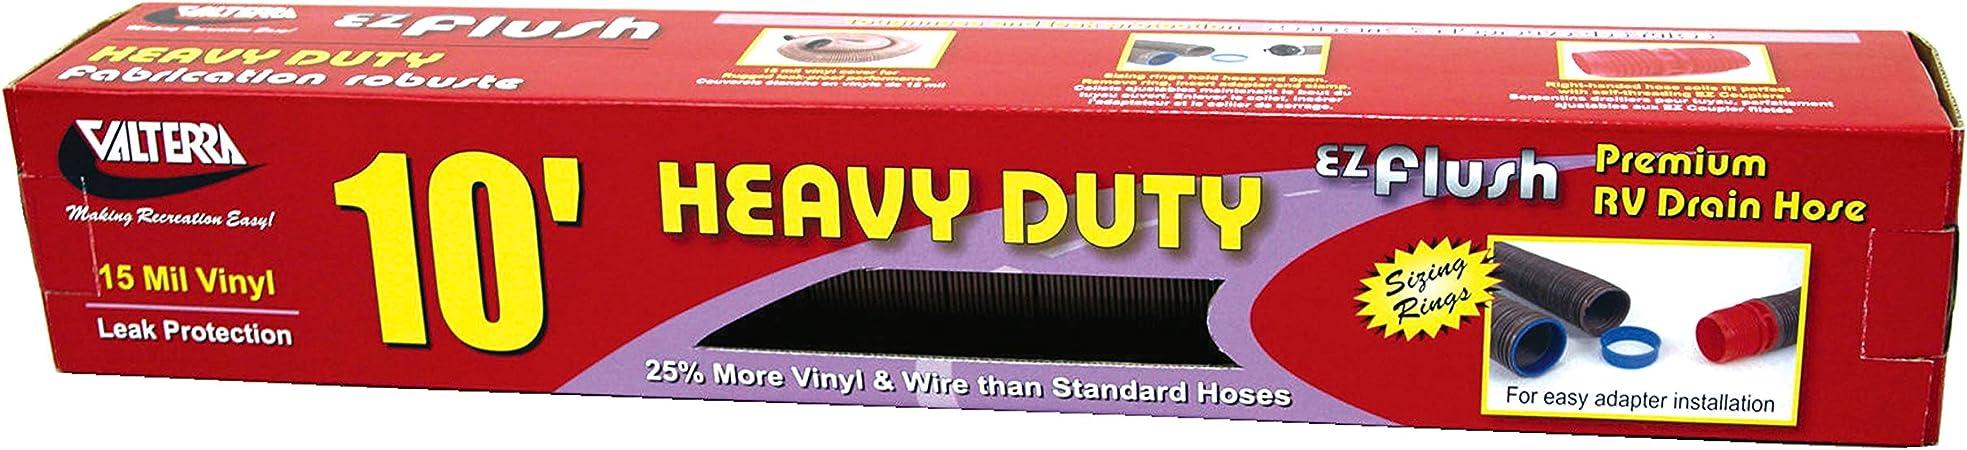 Valterra D04-0012 EZ Flush 10 Bronze Heavy Duty Drain Hose